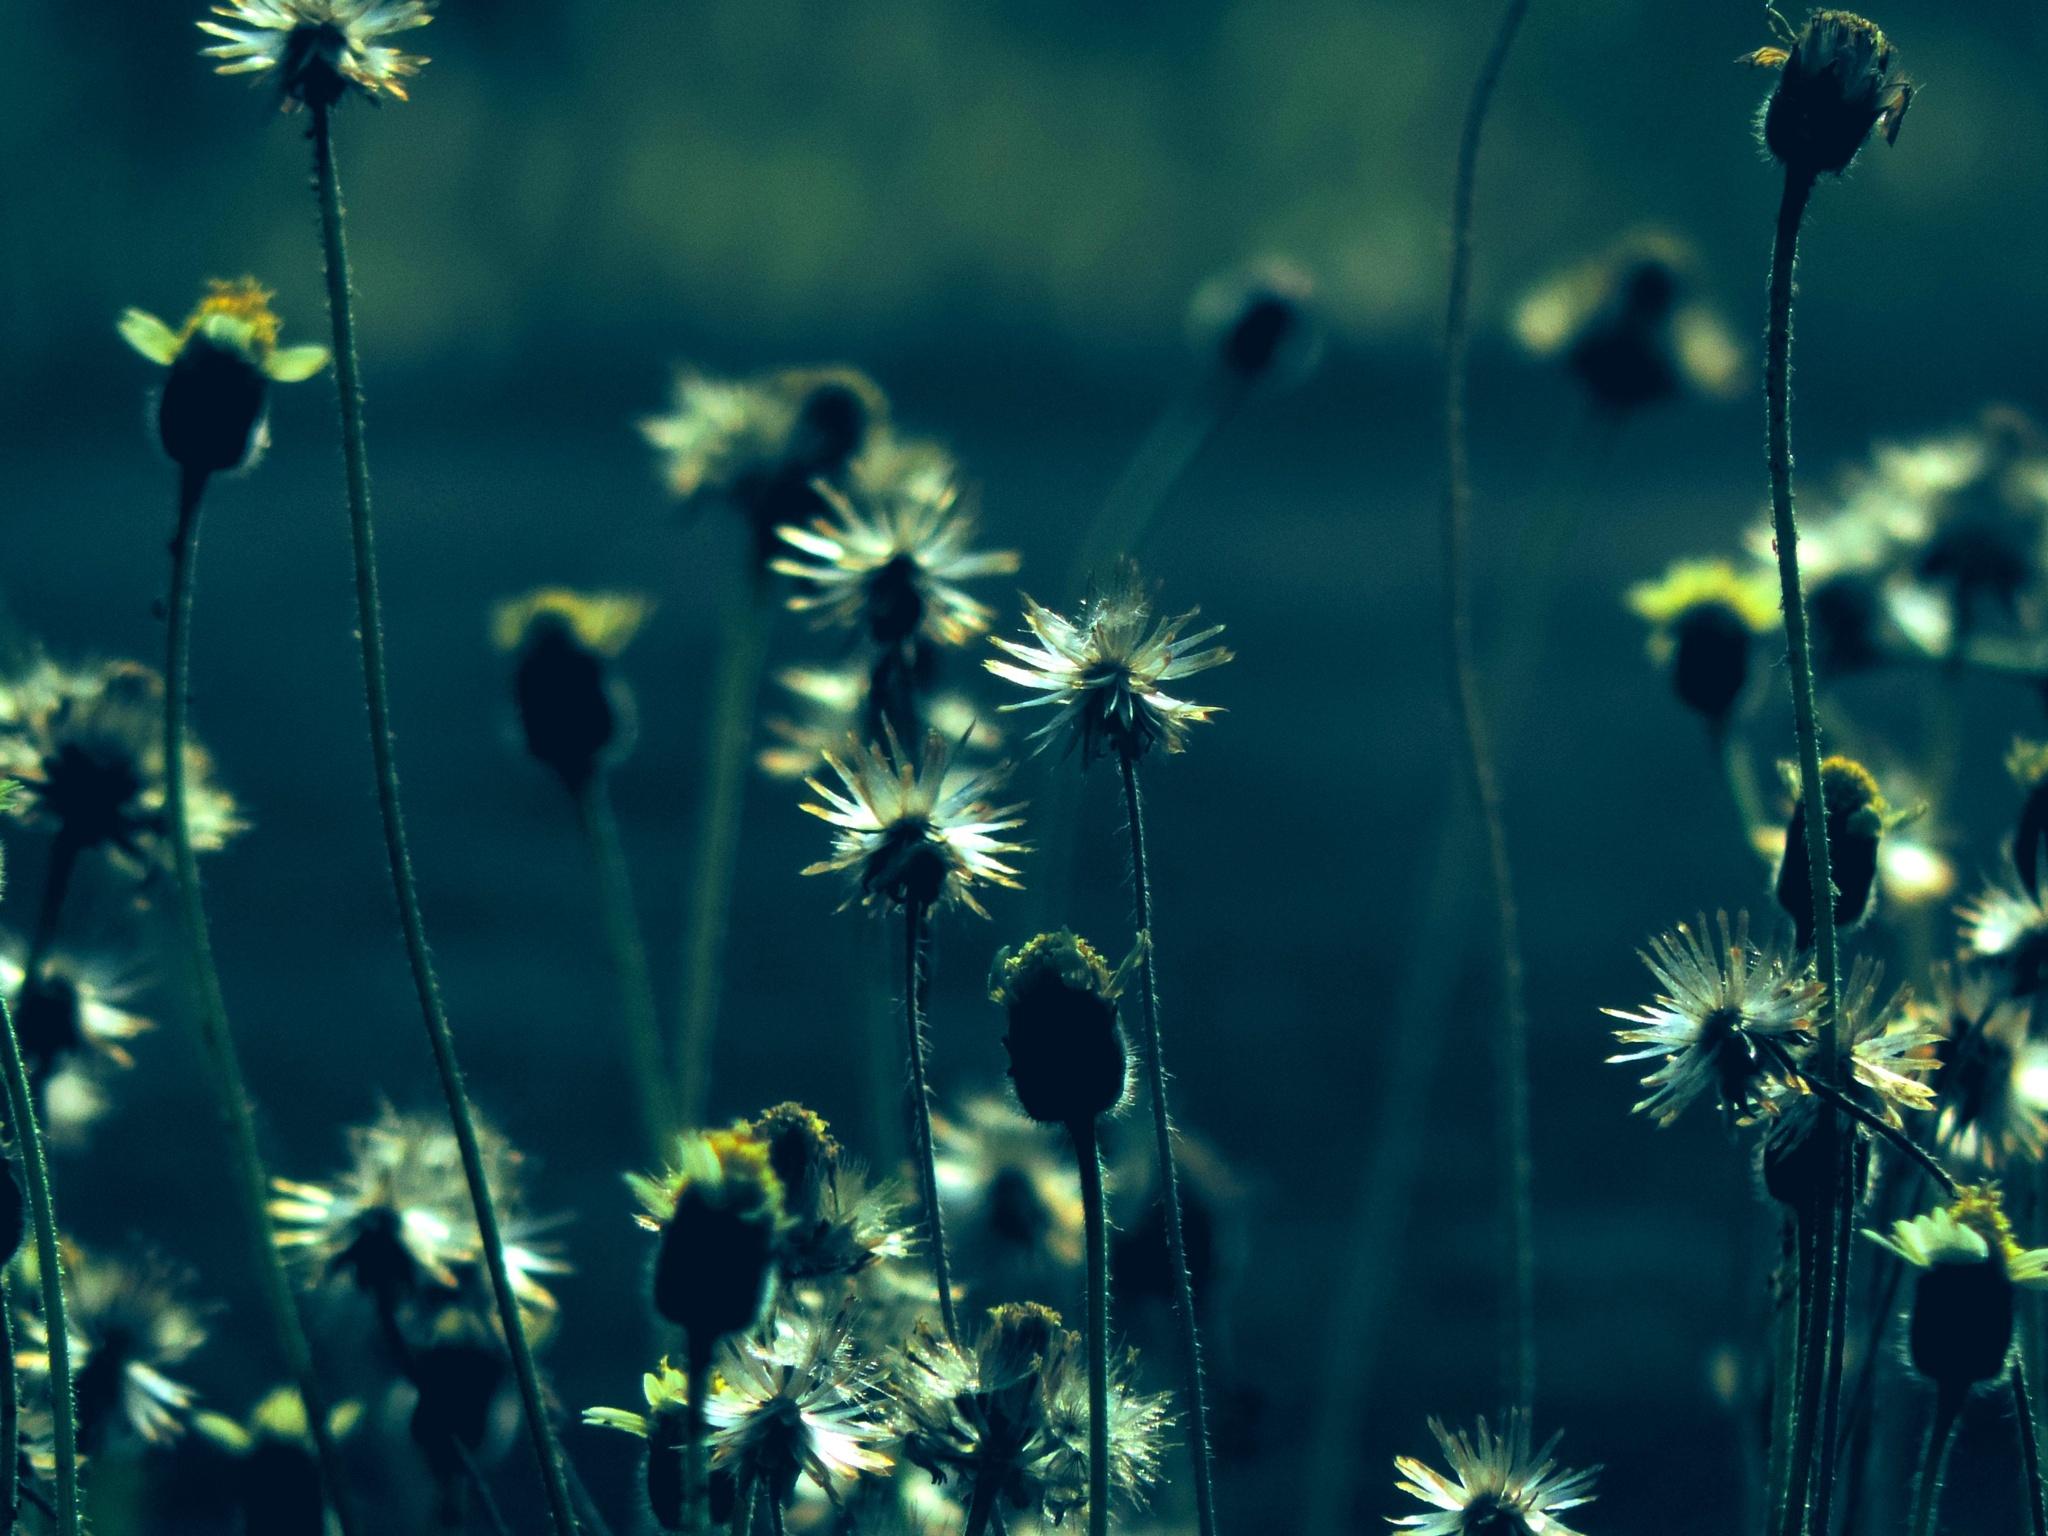 meadows 3 by sunishchalananda